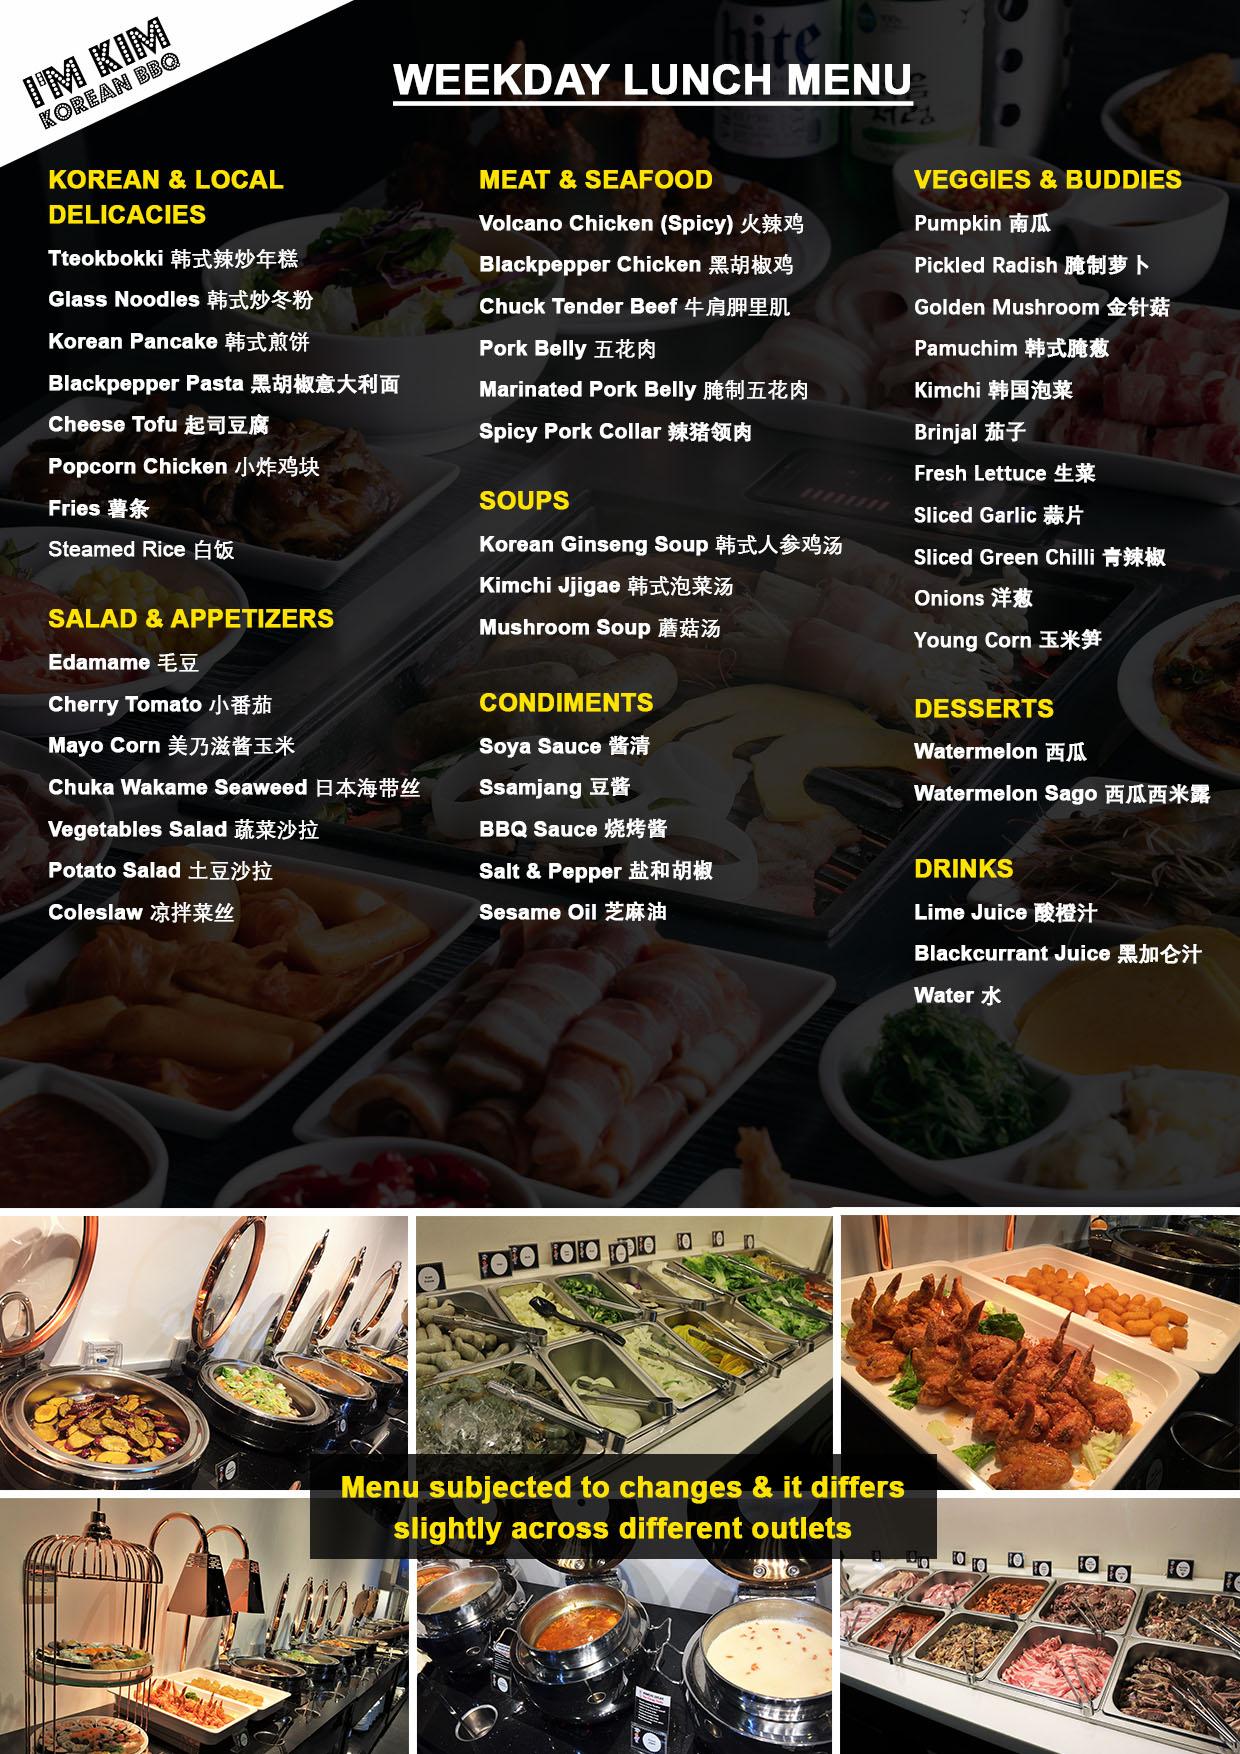 Buffet Menu 2021 (SOTA Wkday Lunch)